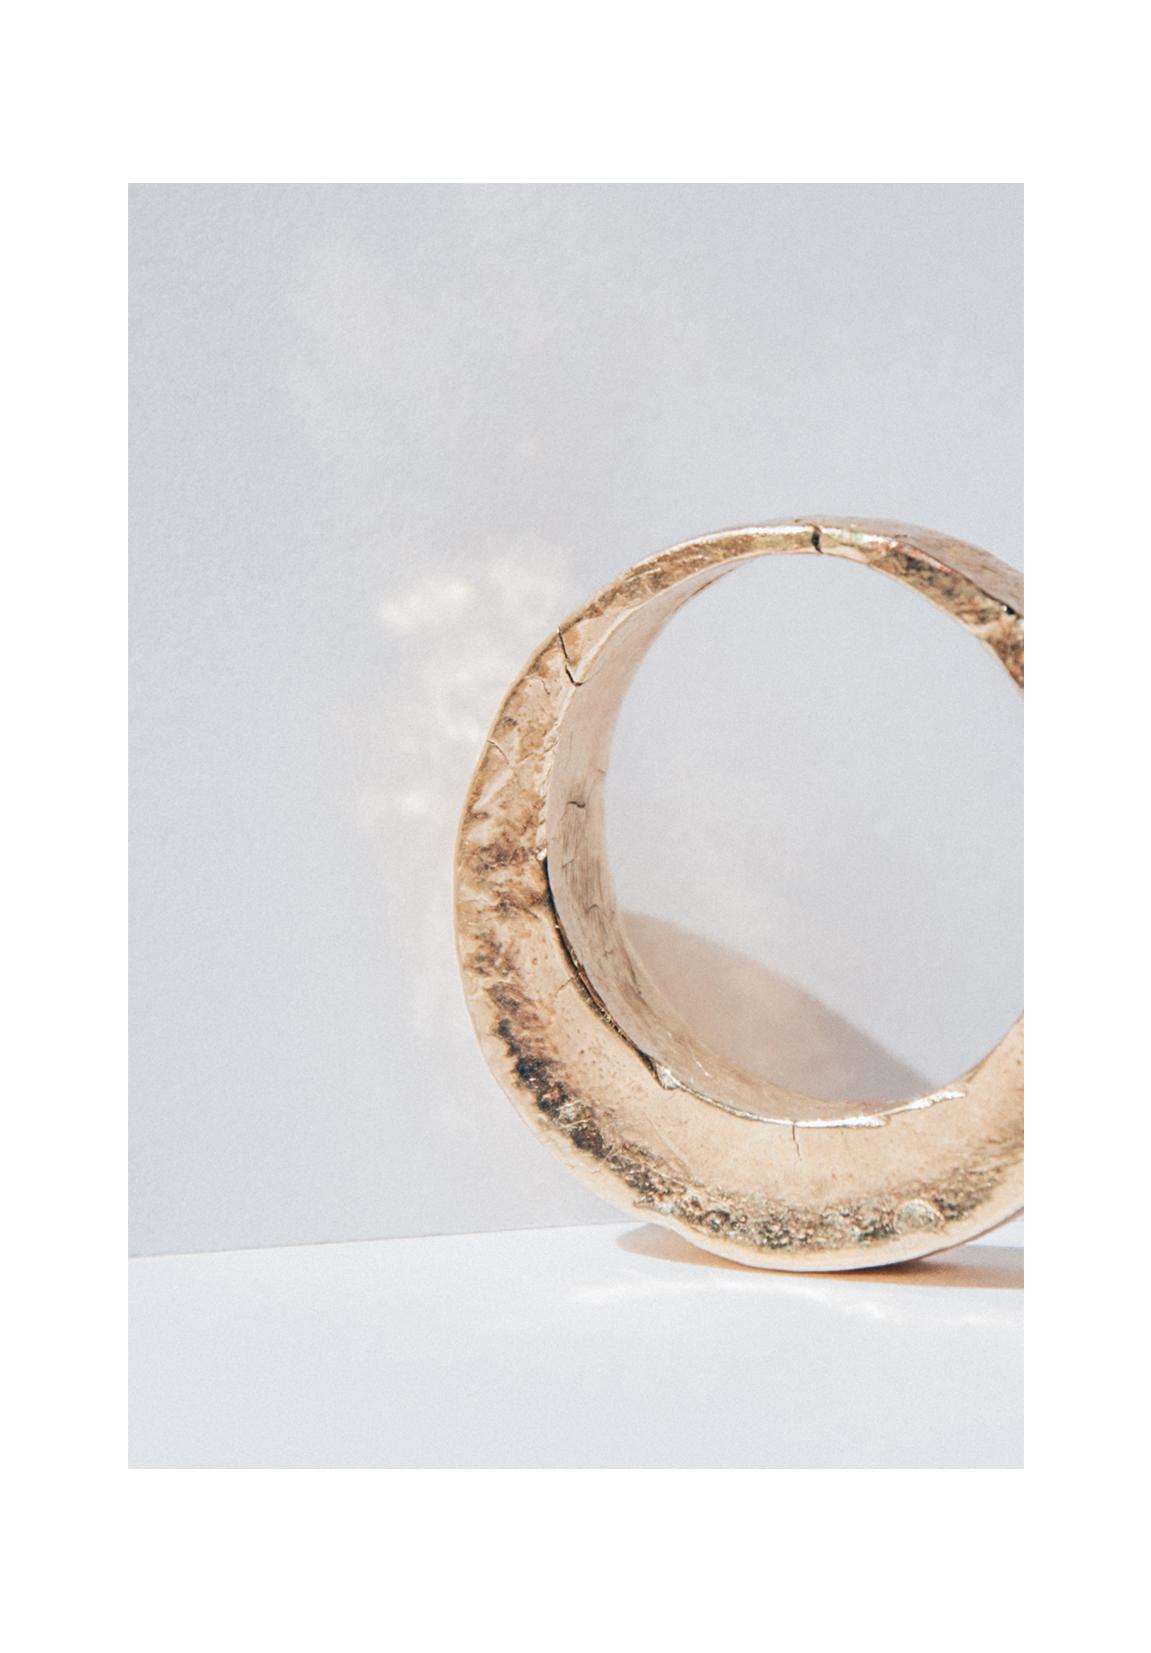 Rebecca Pinto Jewelry Lookbook photography